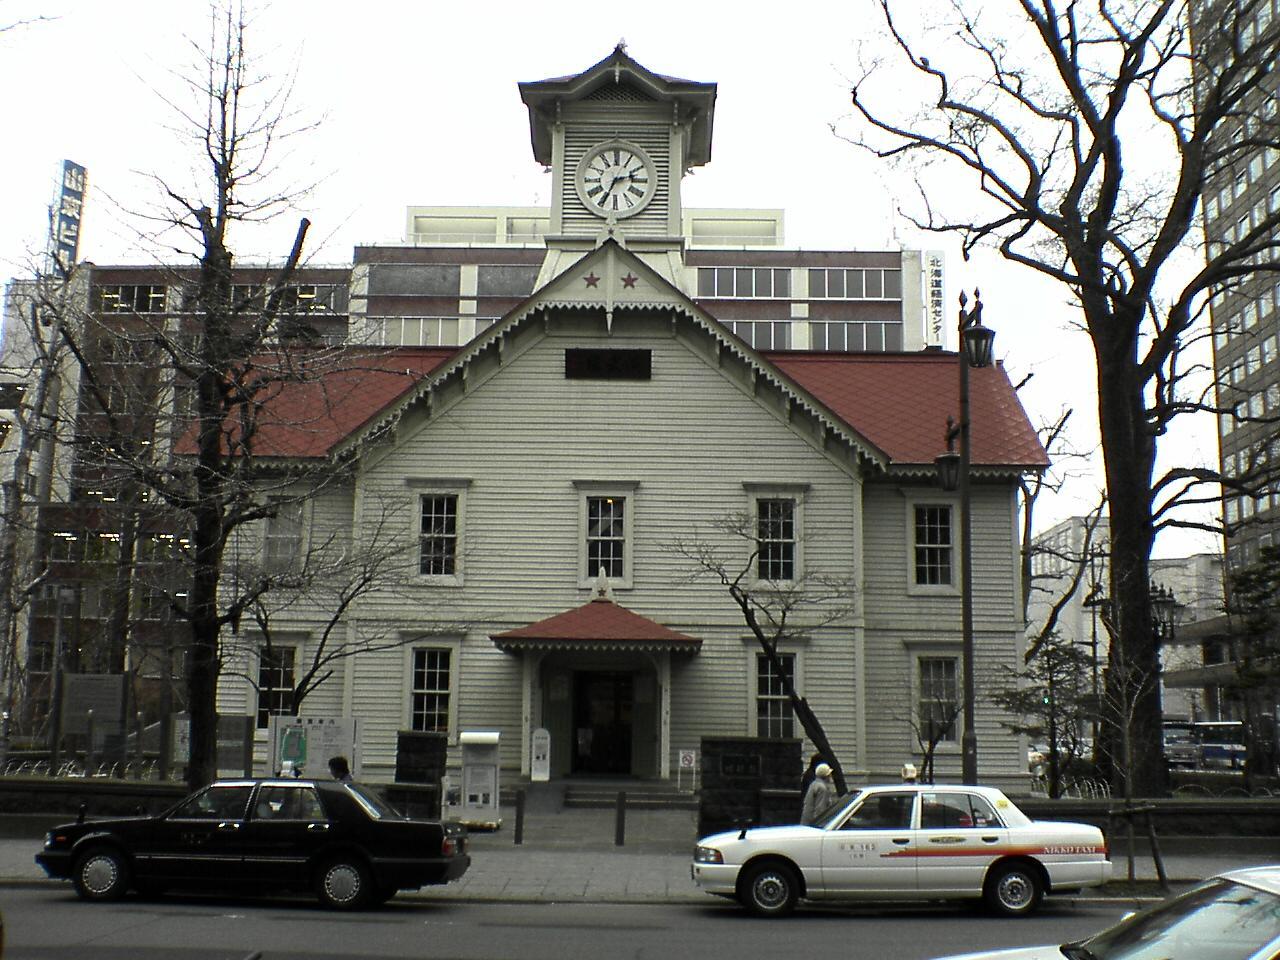 File:Sapporo Clock Tower Hokkaido Japan 2.jpg - Wikimedia Commons